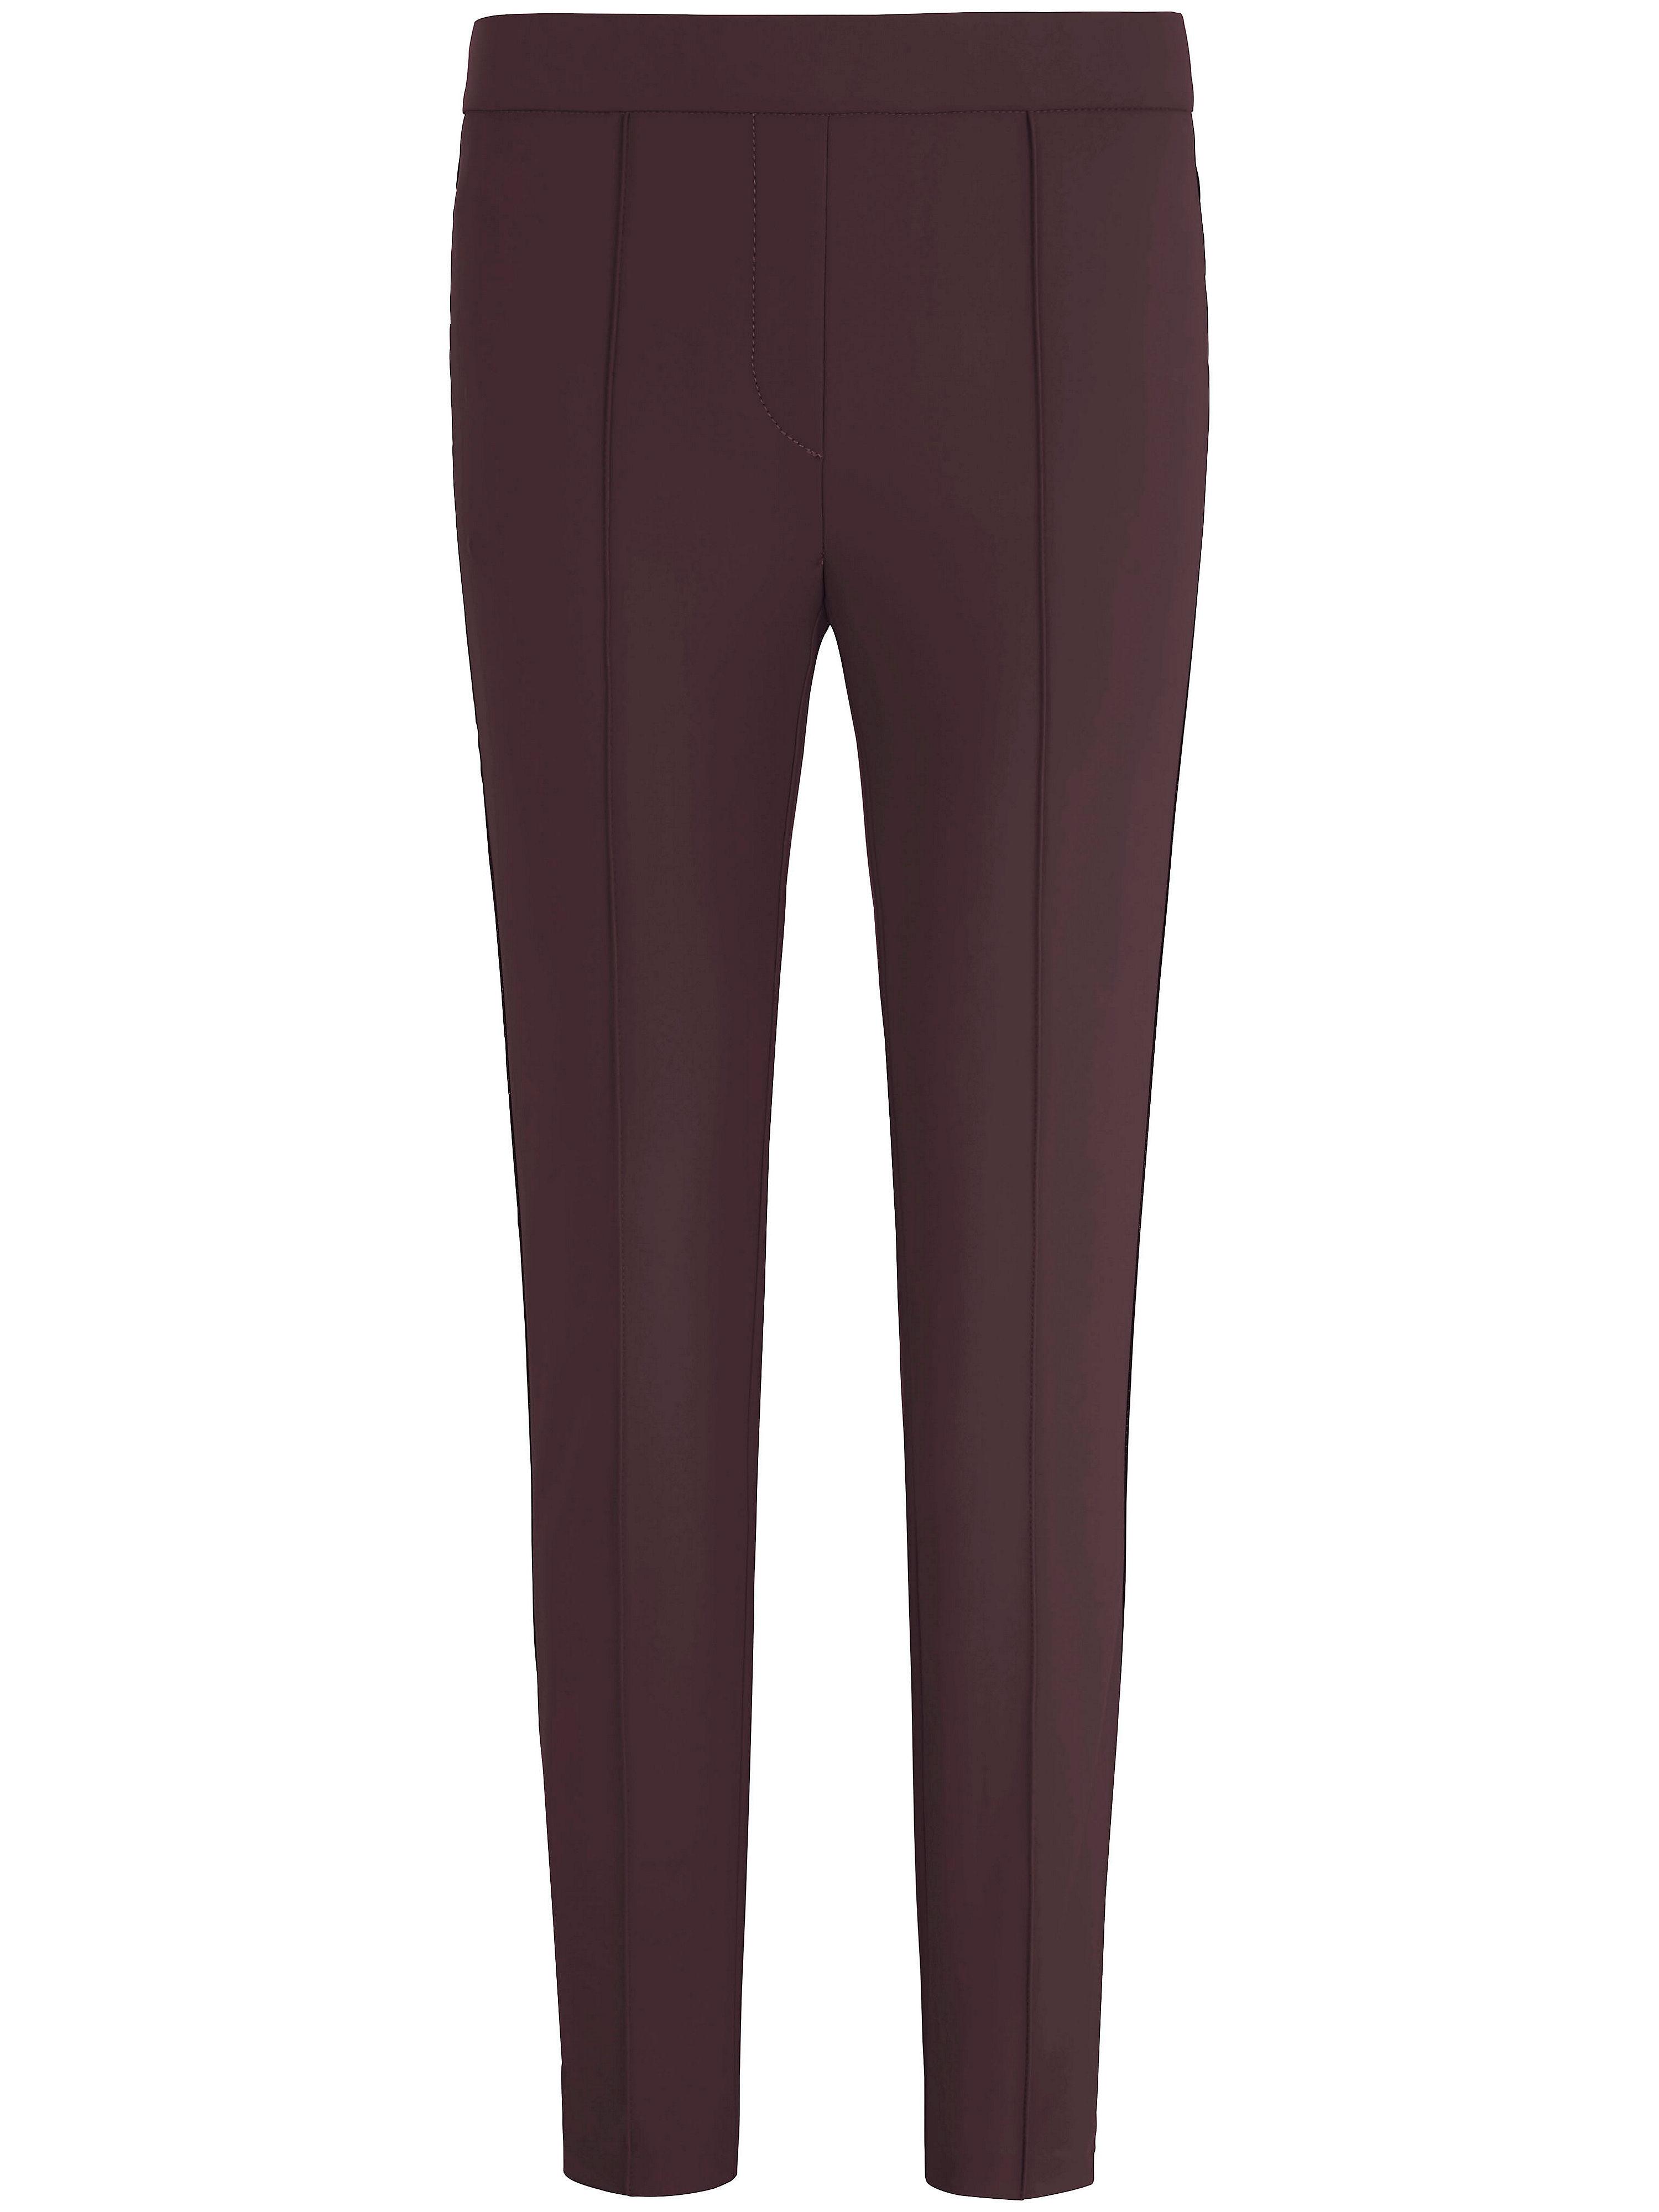 Comfortabele broek, model Jenny Aktive Van Toni rood